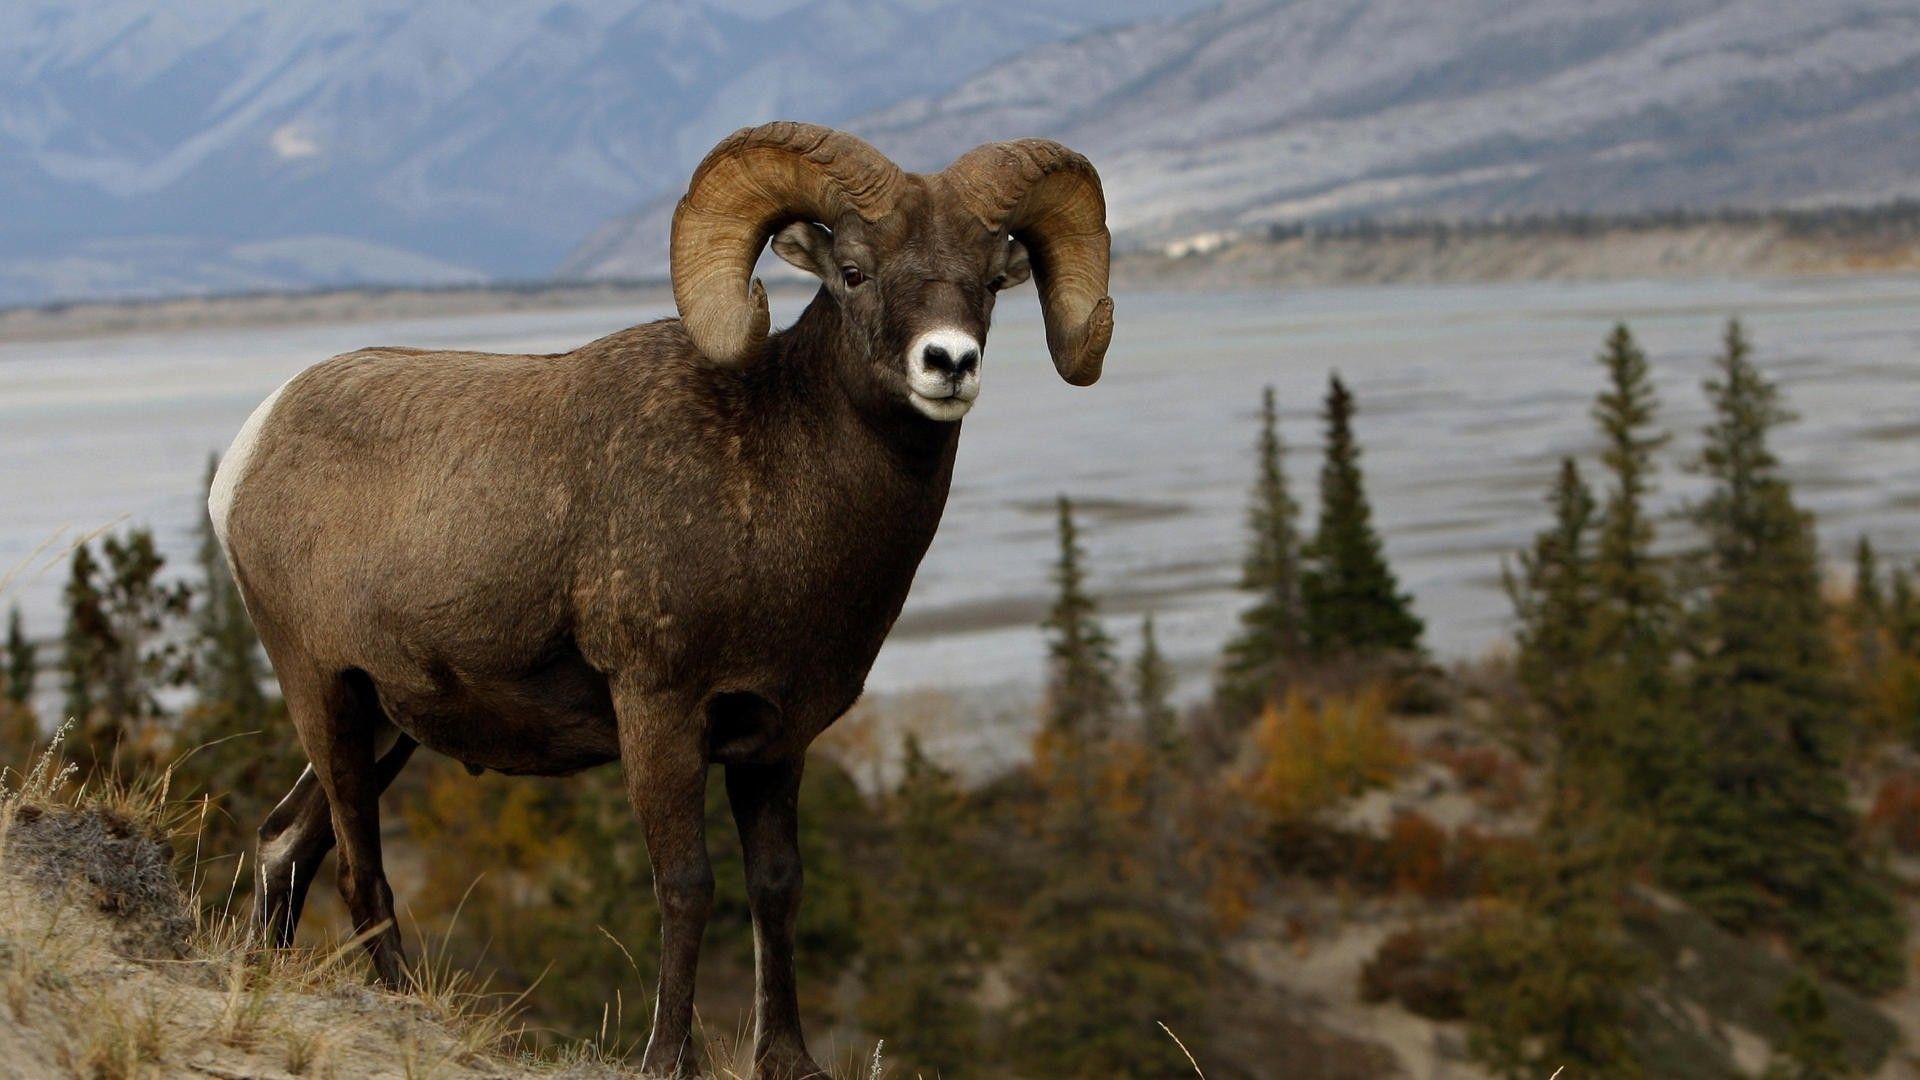 Animals Mountains Nature Ram Sheep Wallpaper Pet Birds North American Animals Animals